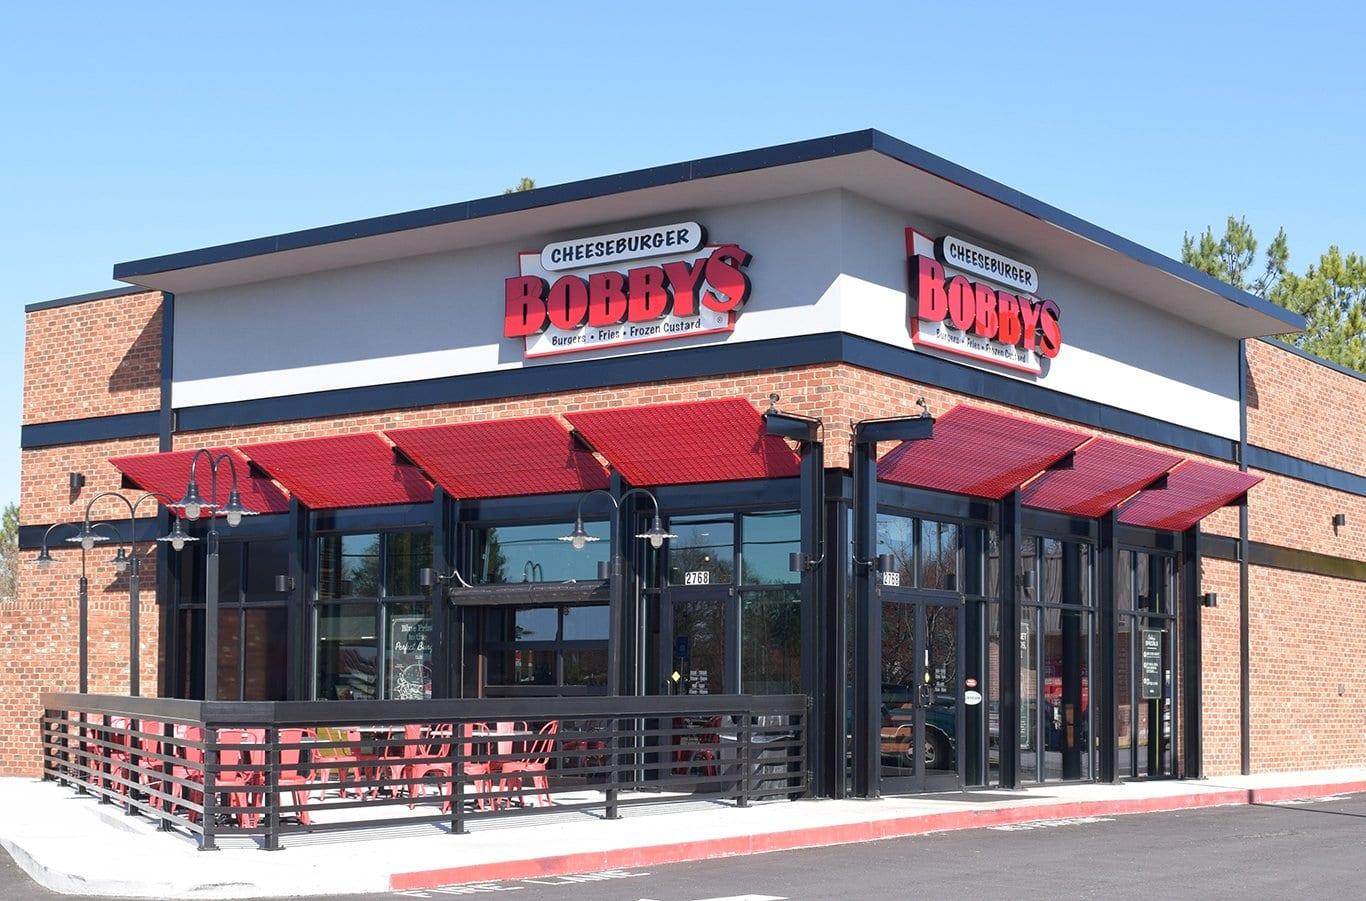 cheeseburger bobby u0027scheeseburger bobby u0027s burgers fries u0026 more